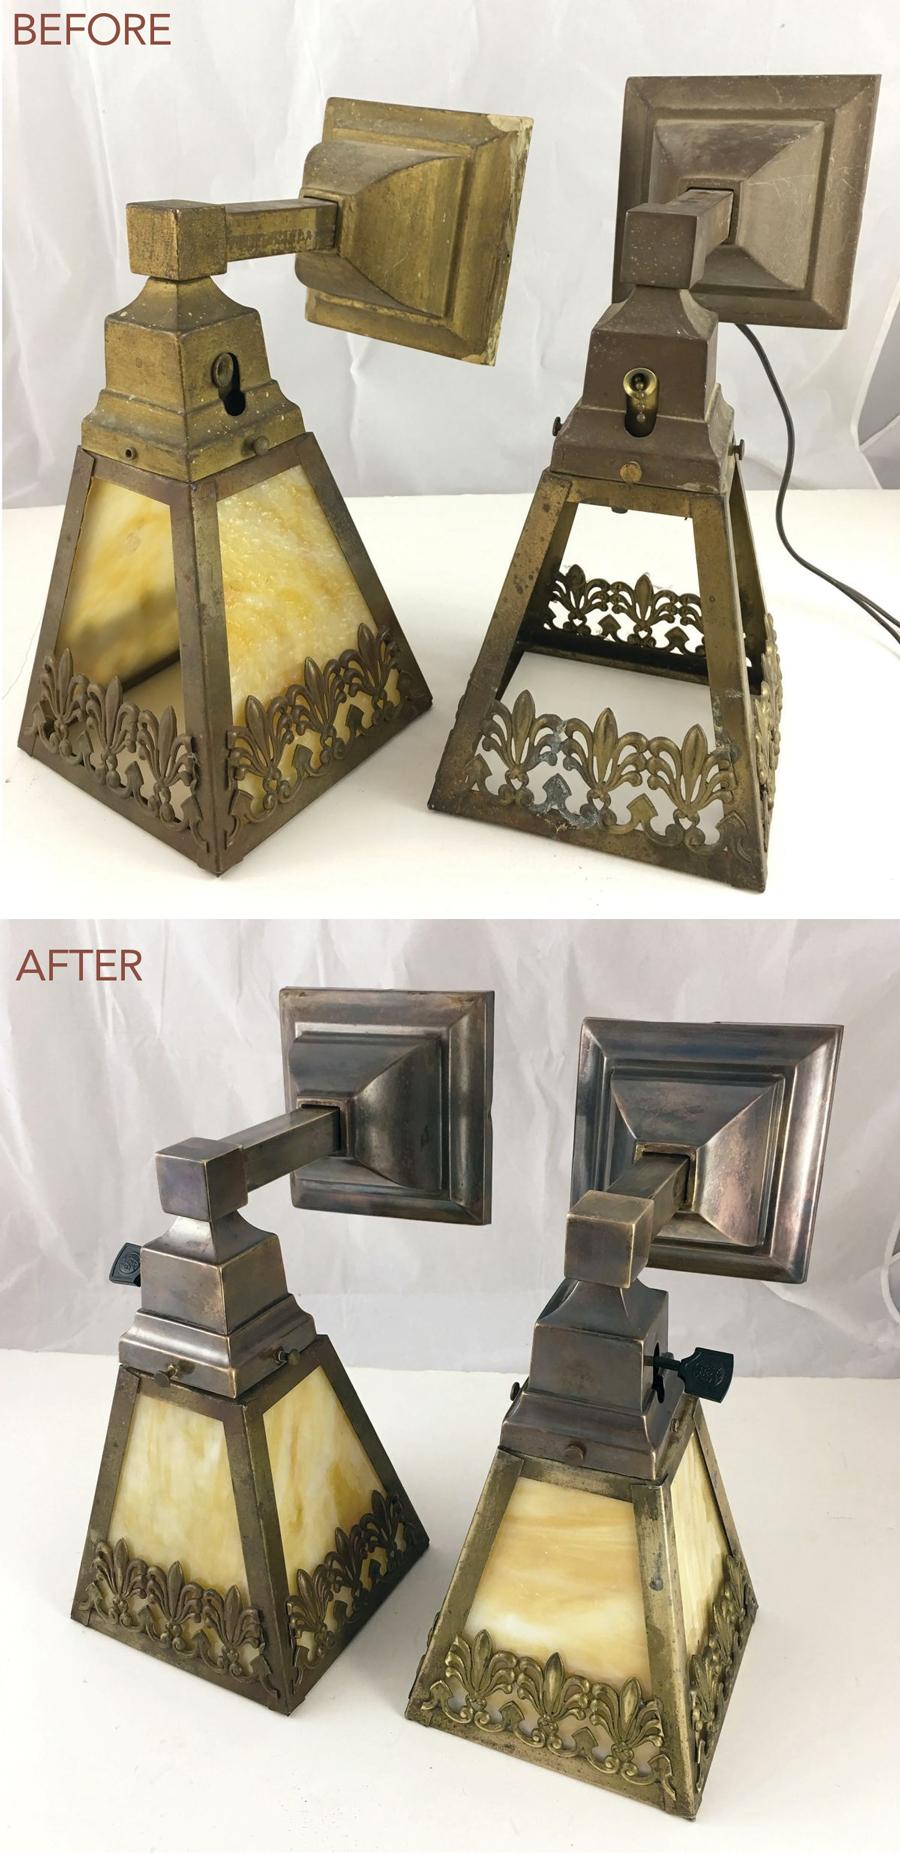 Restoring Antique Lighting - Old House Journal Magazine